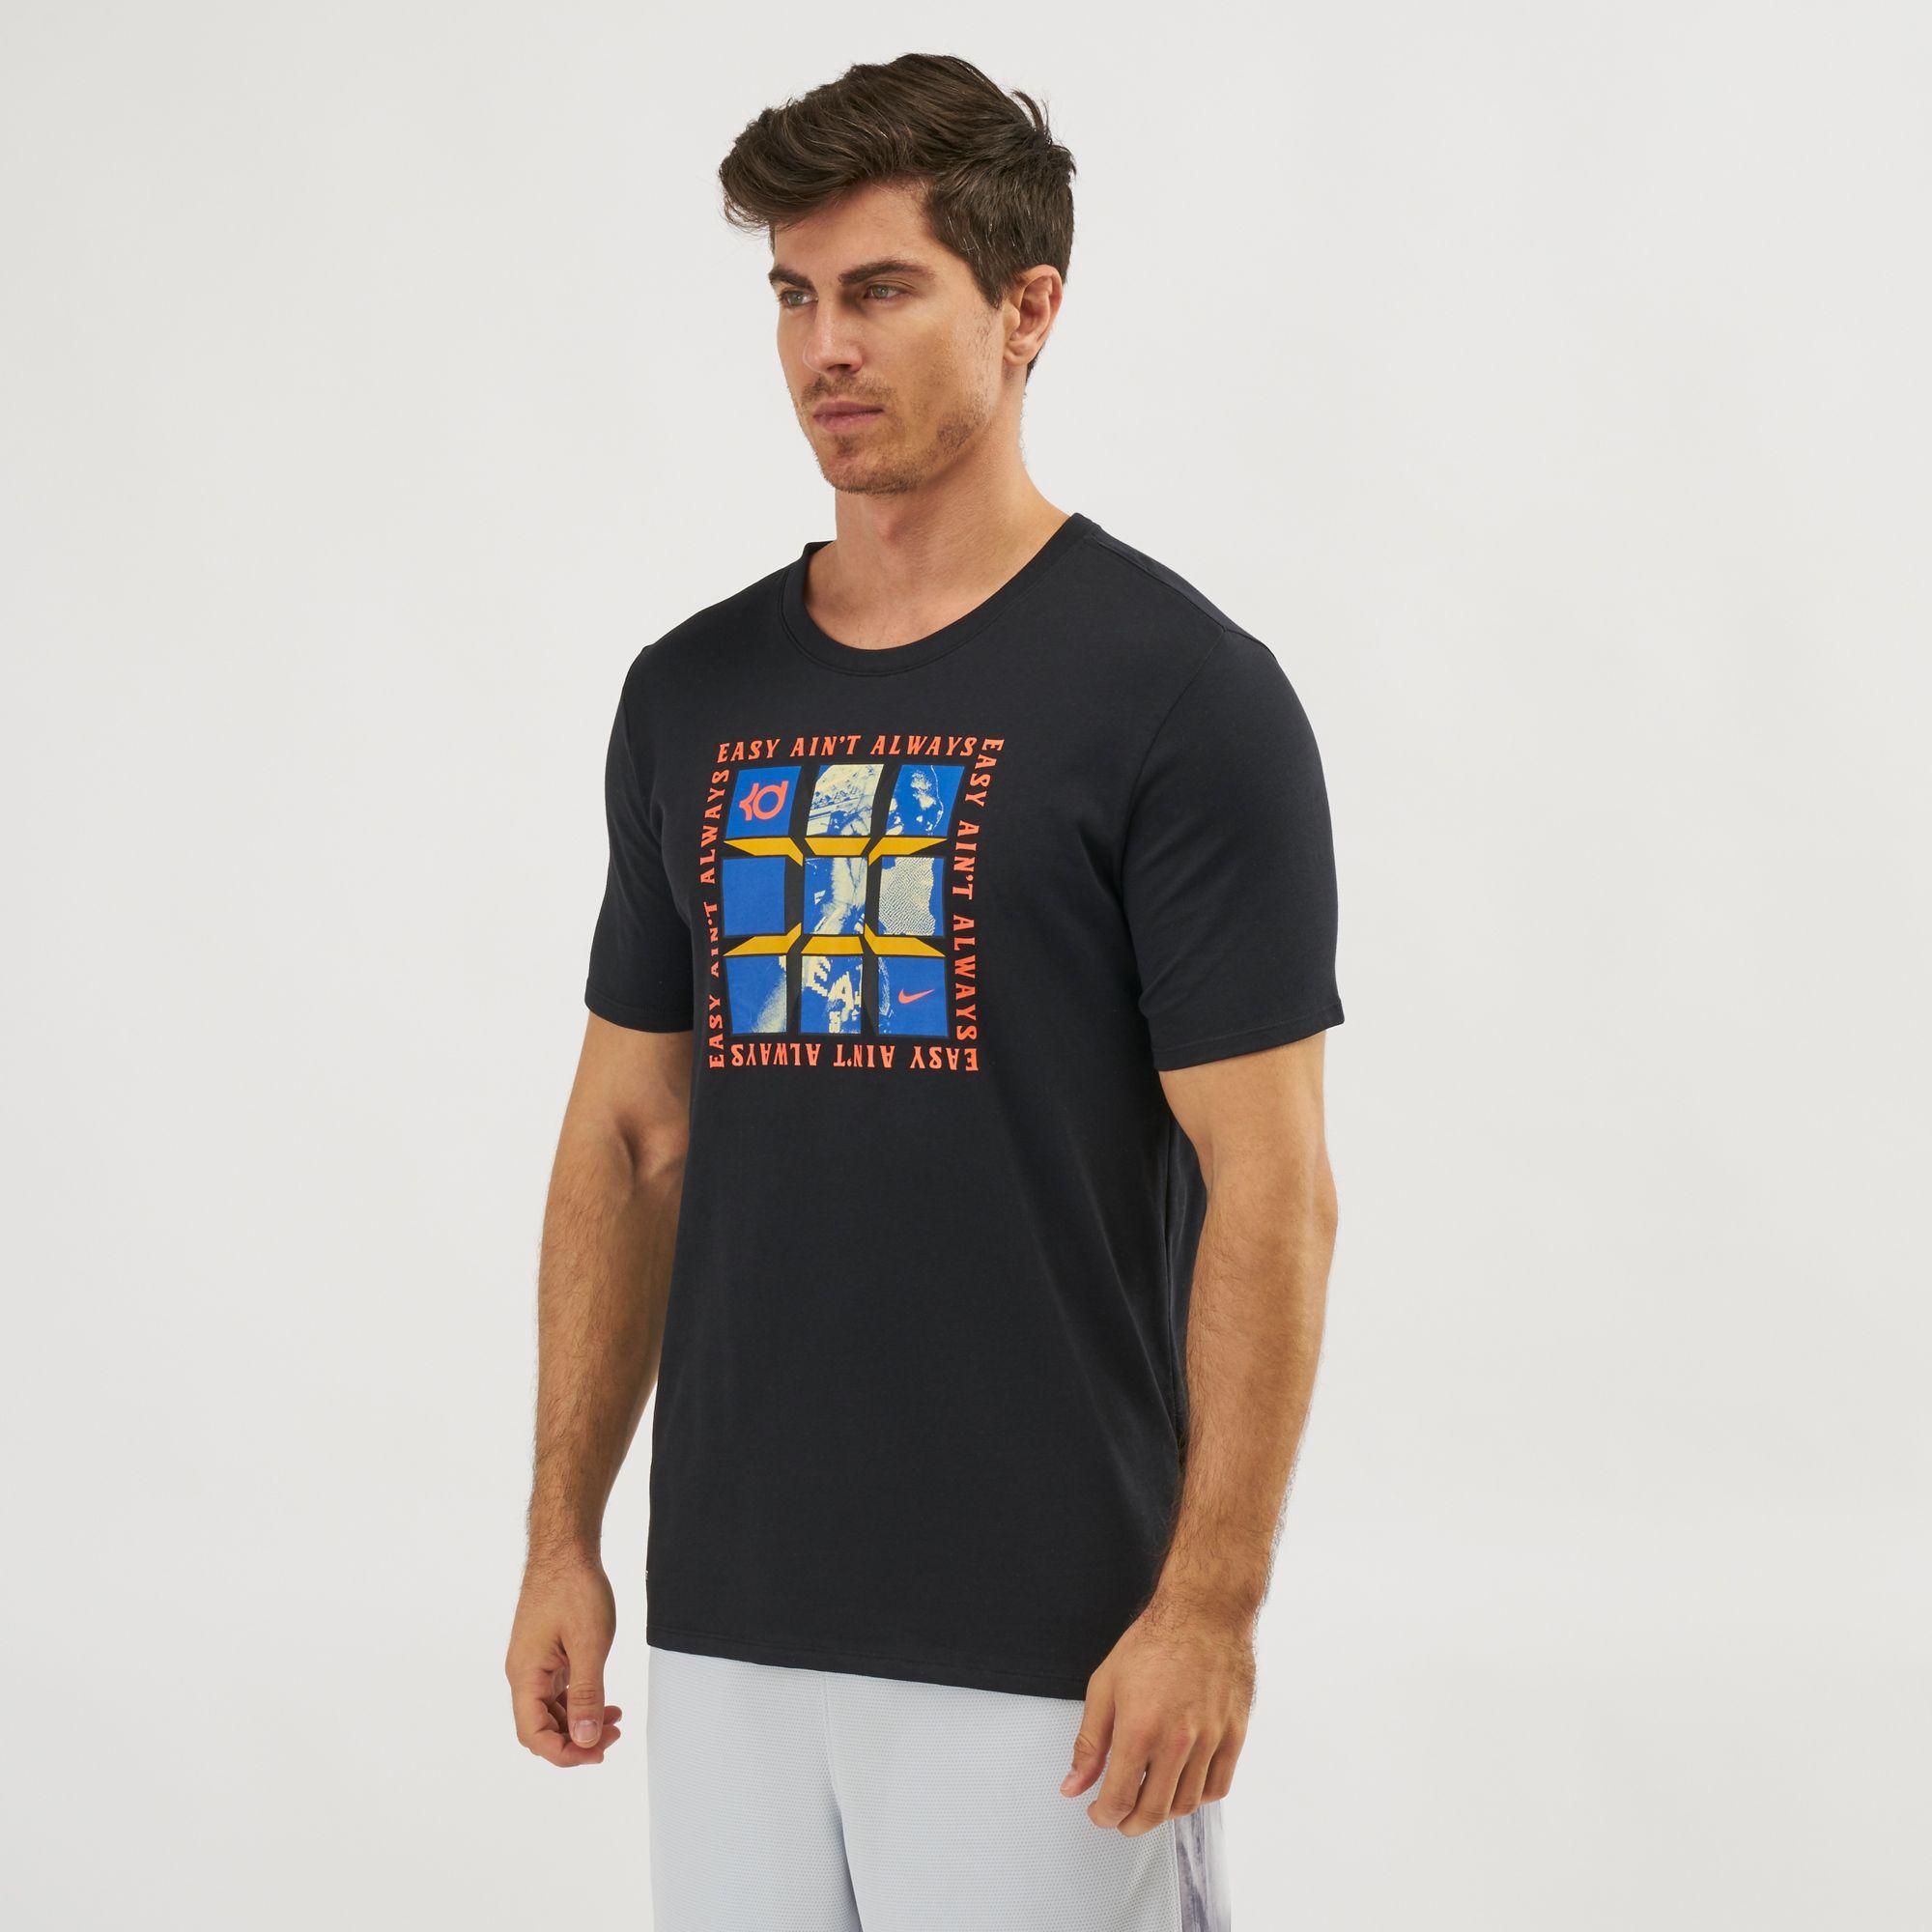 KD T Shirt Nike Dri-FIT KD T-Shirt | T-Shirts | Tops | Clothing | Men's Sale ...